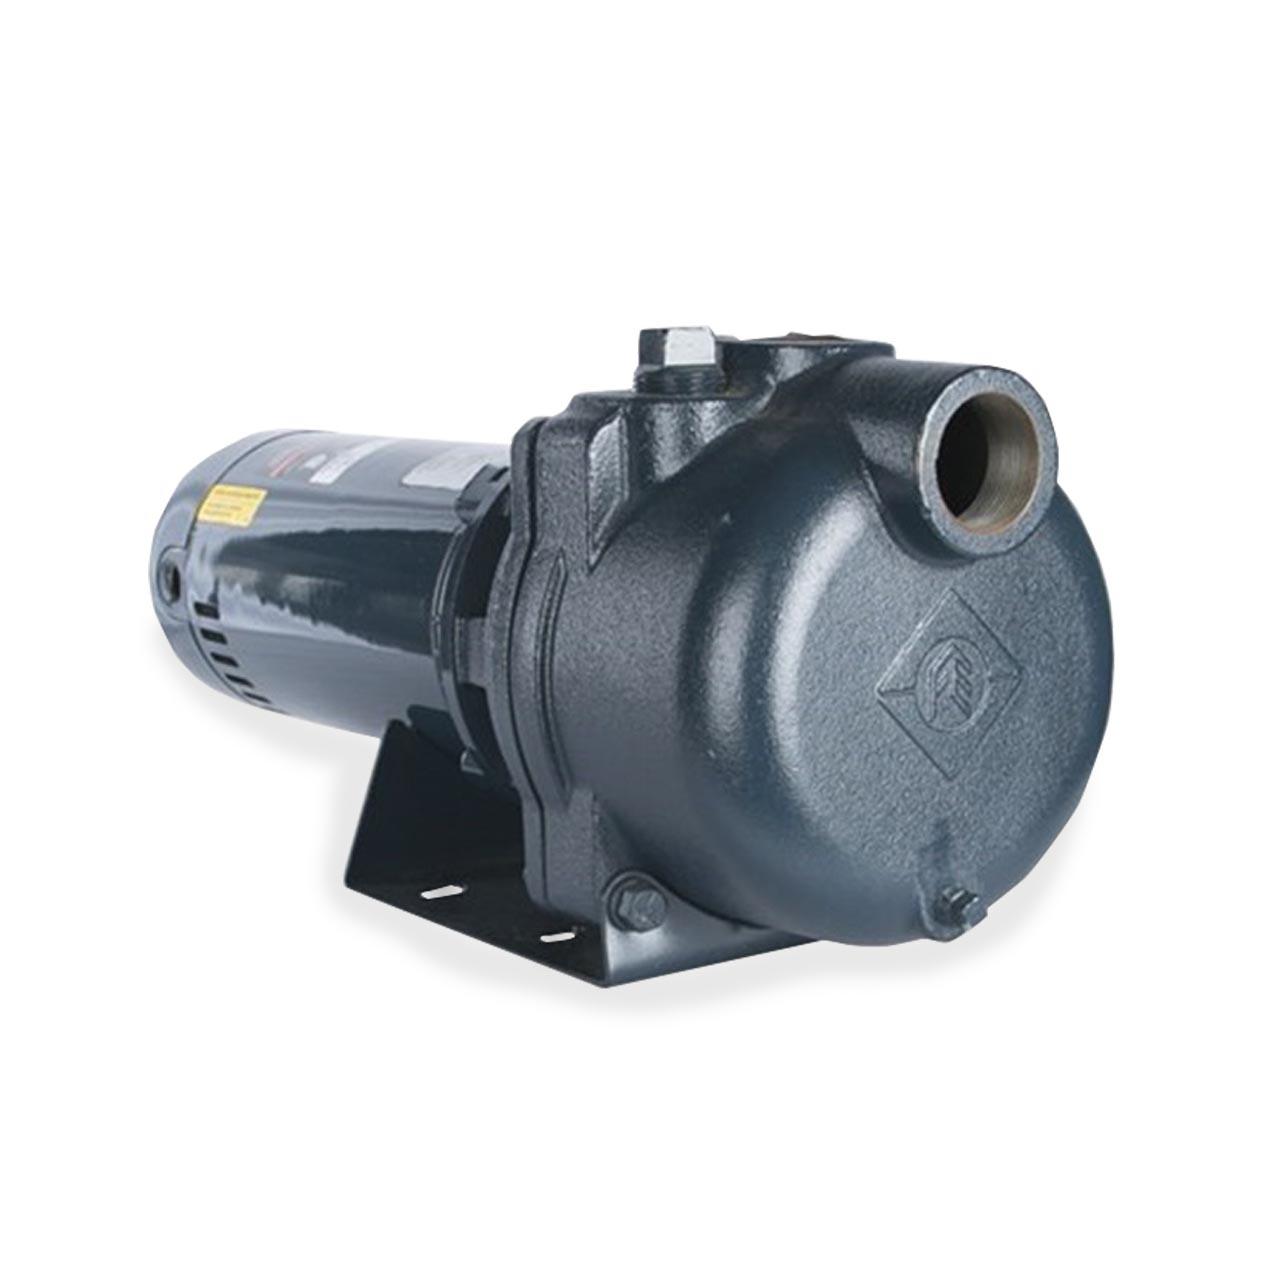 Franklin Electric - Franklin Electric FTB2CI-SSI Turf Boss Self Priming Pump  2.0 HP 230V 1 Phase #FEC92981020